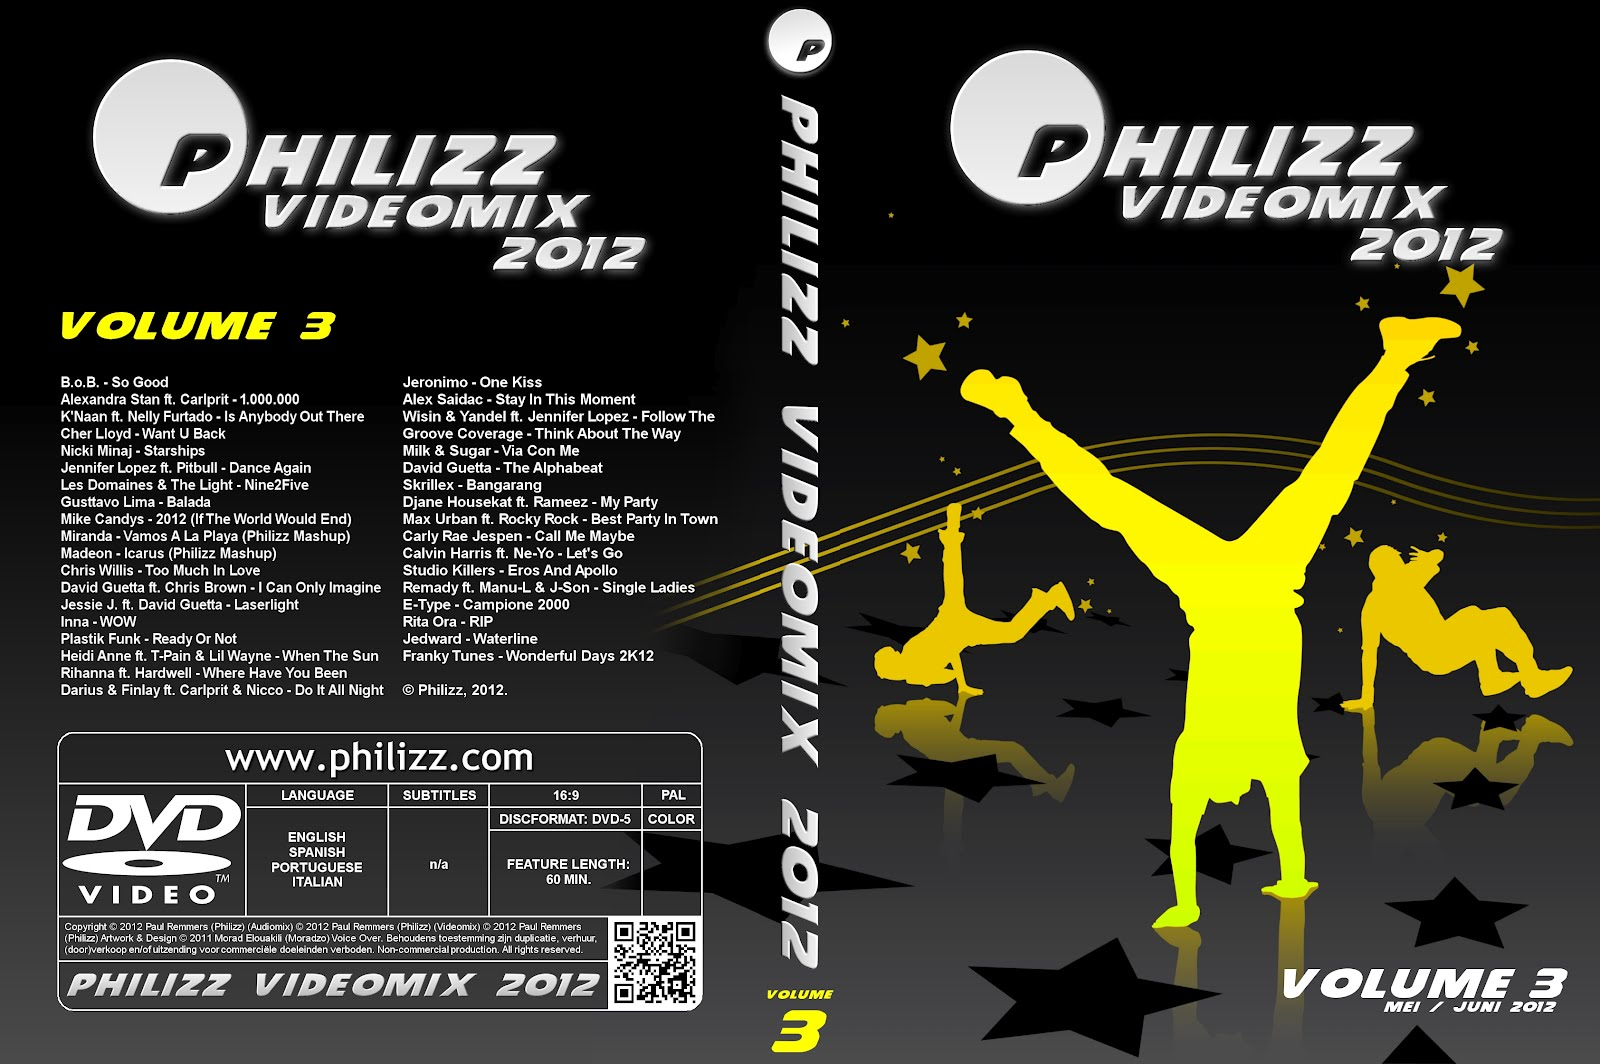 Philizz Videomix 2012 - Volume 3